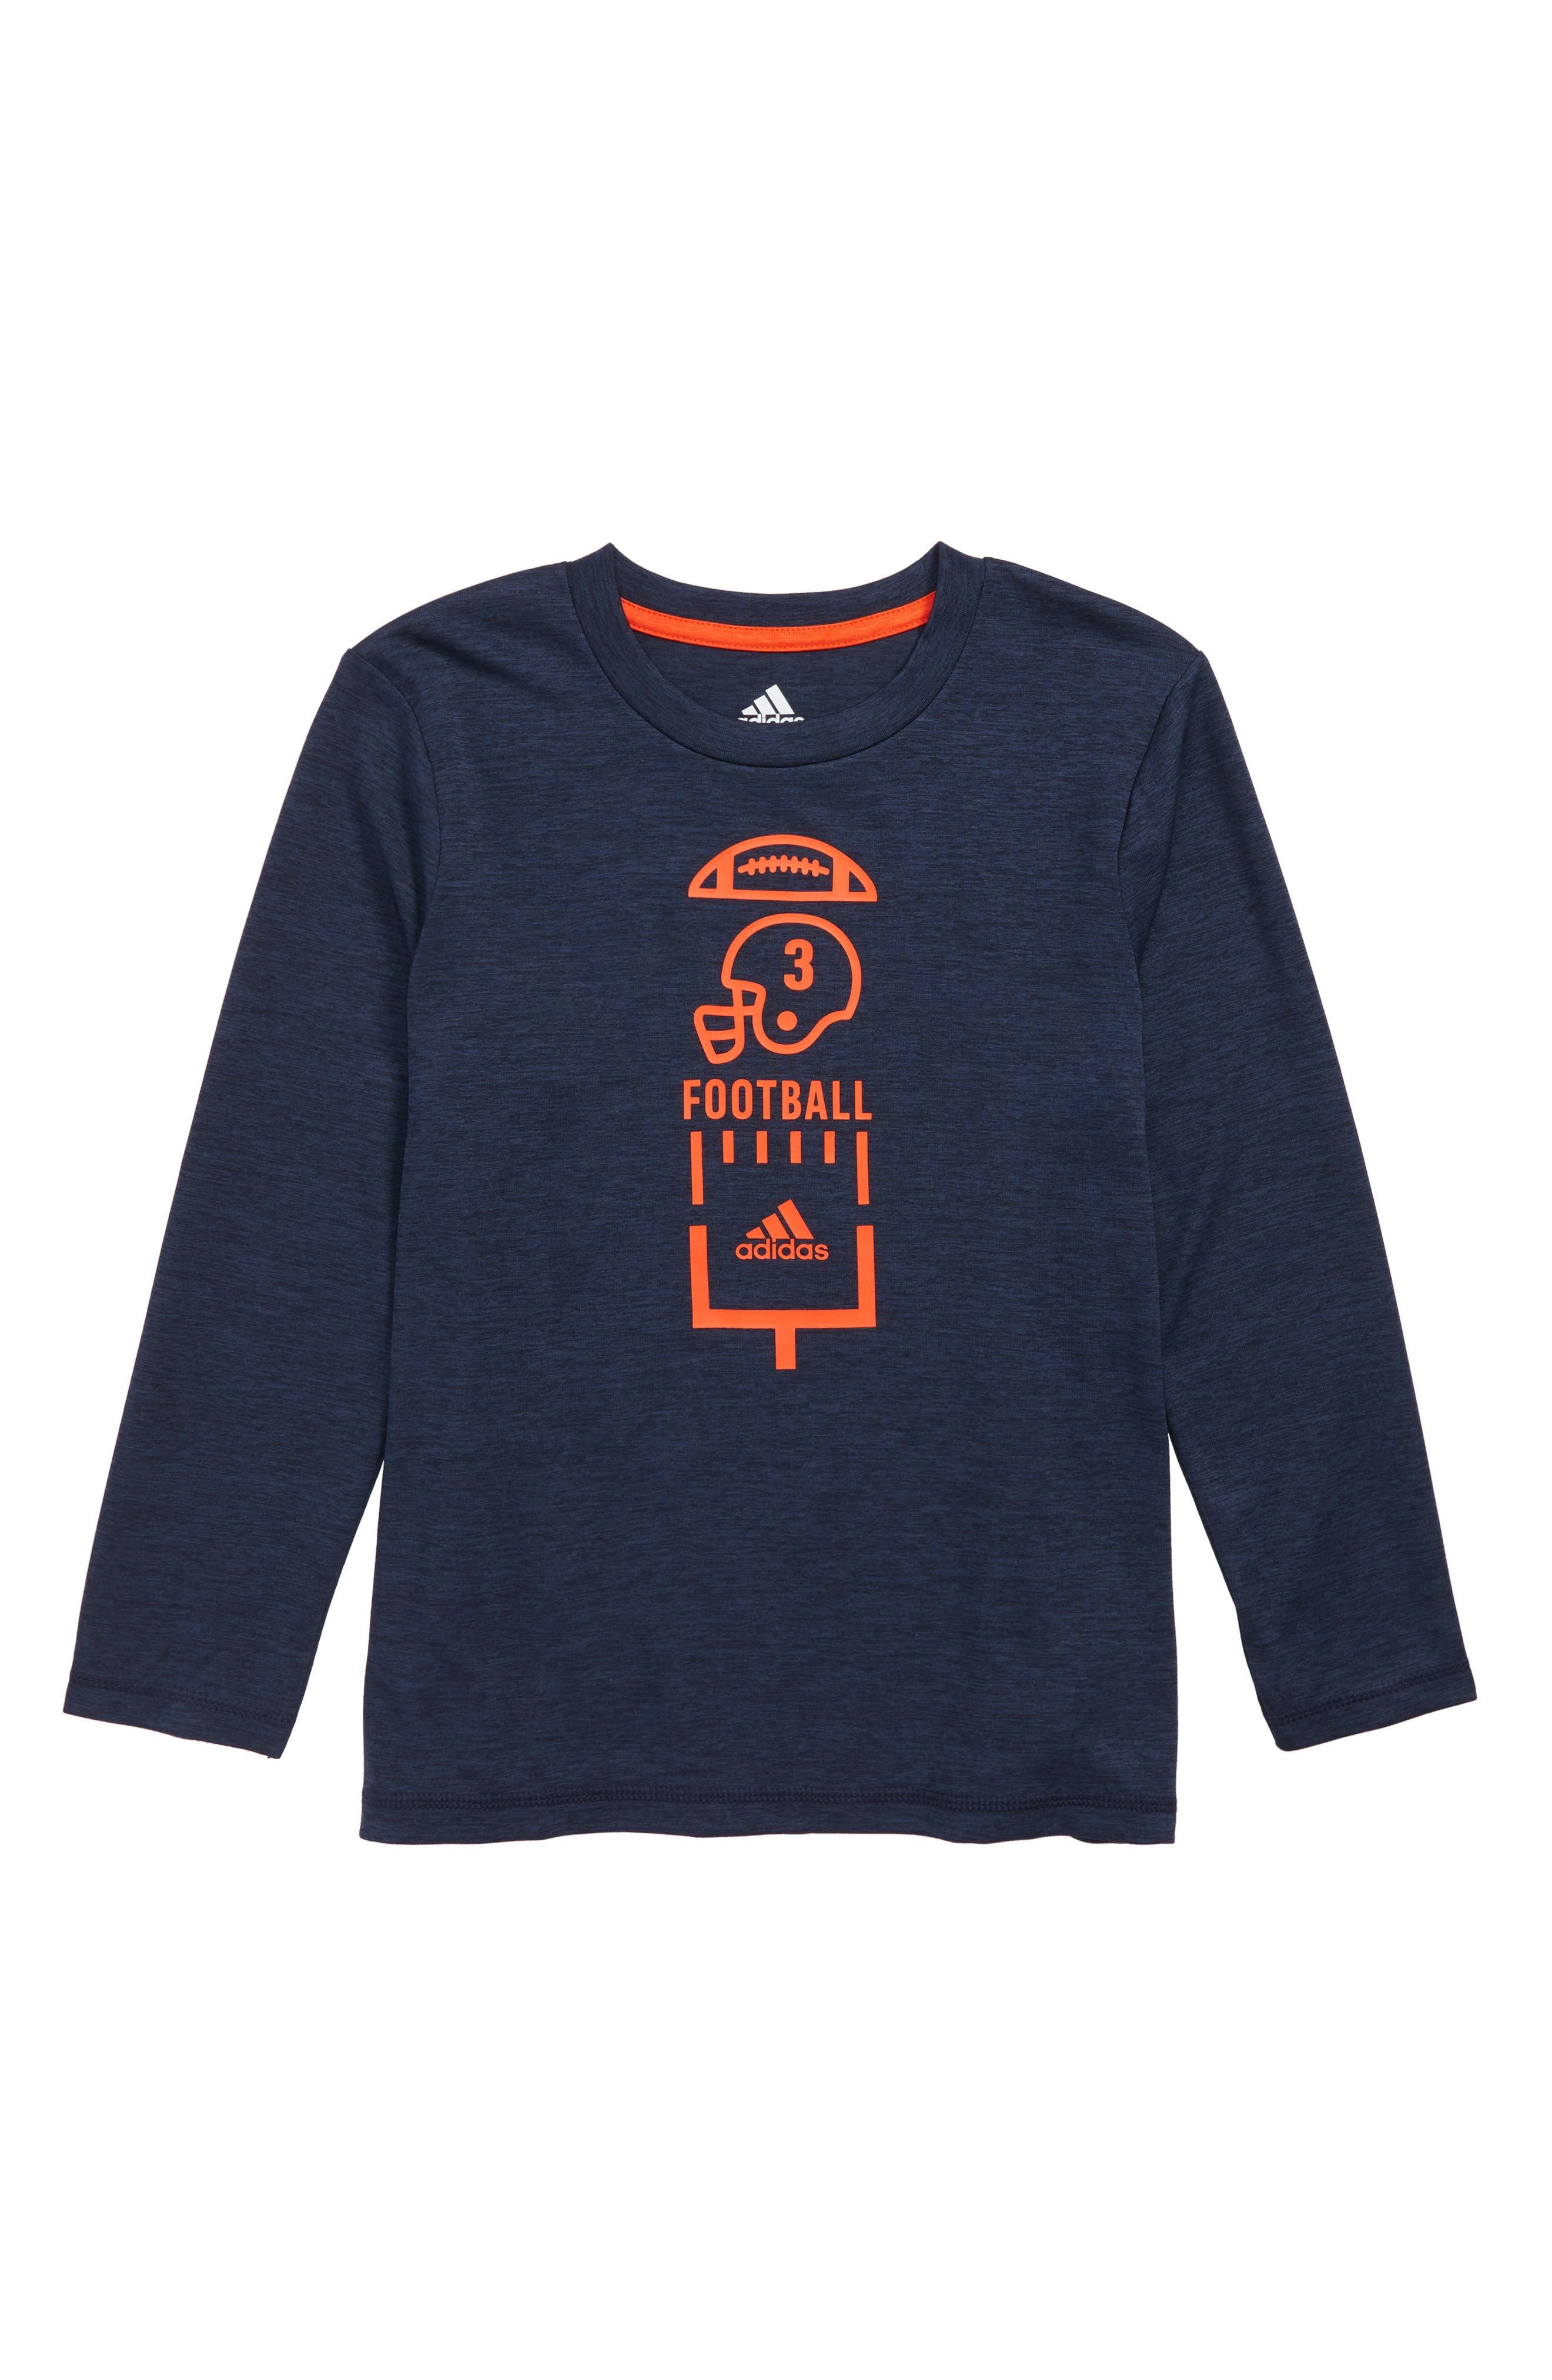 Football Vertical Collage T-Shirt,                             Main thumbnail 1, color,                             Navy